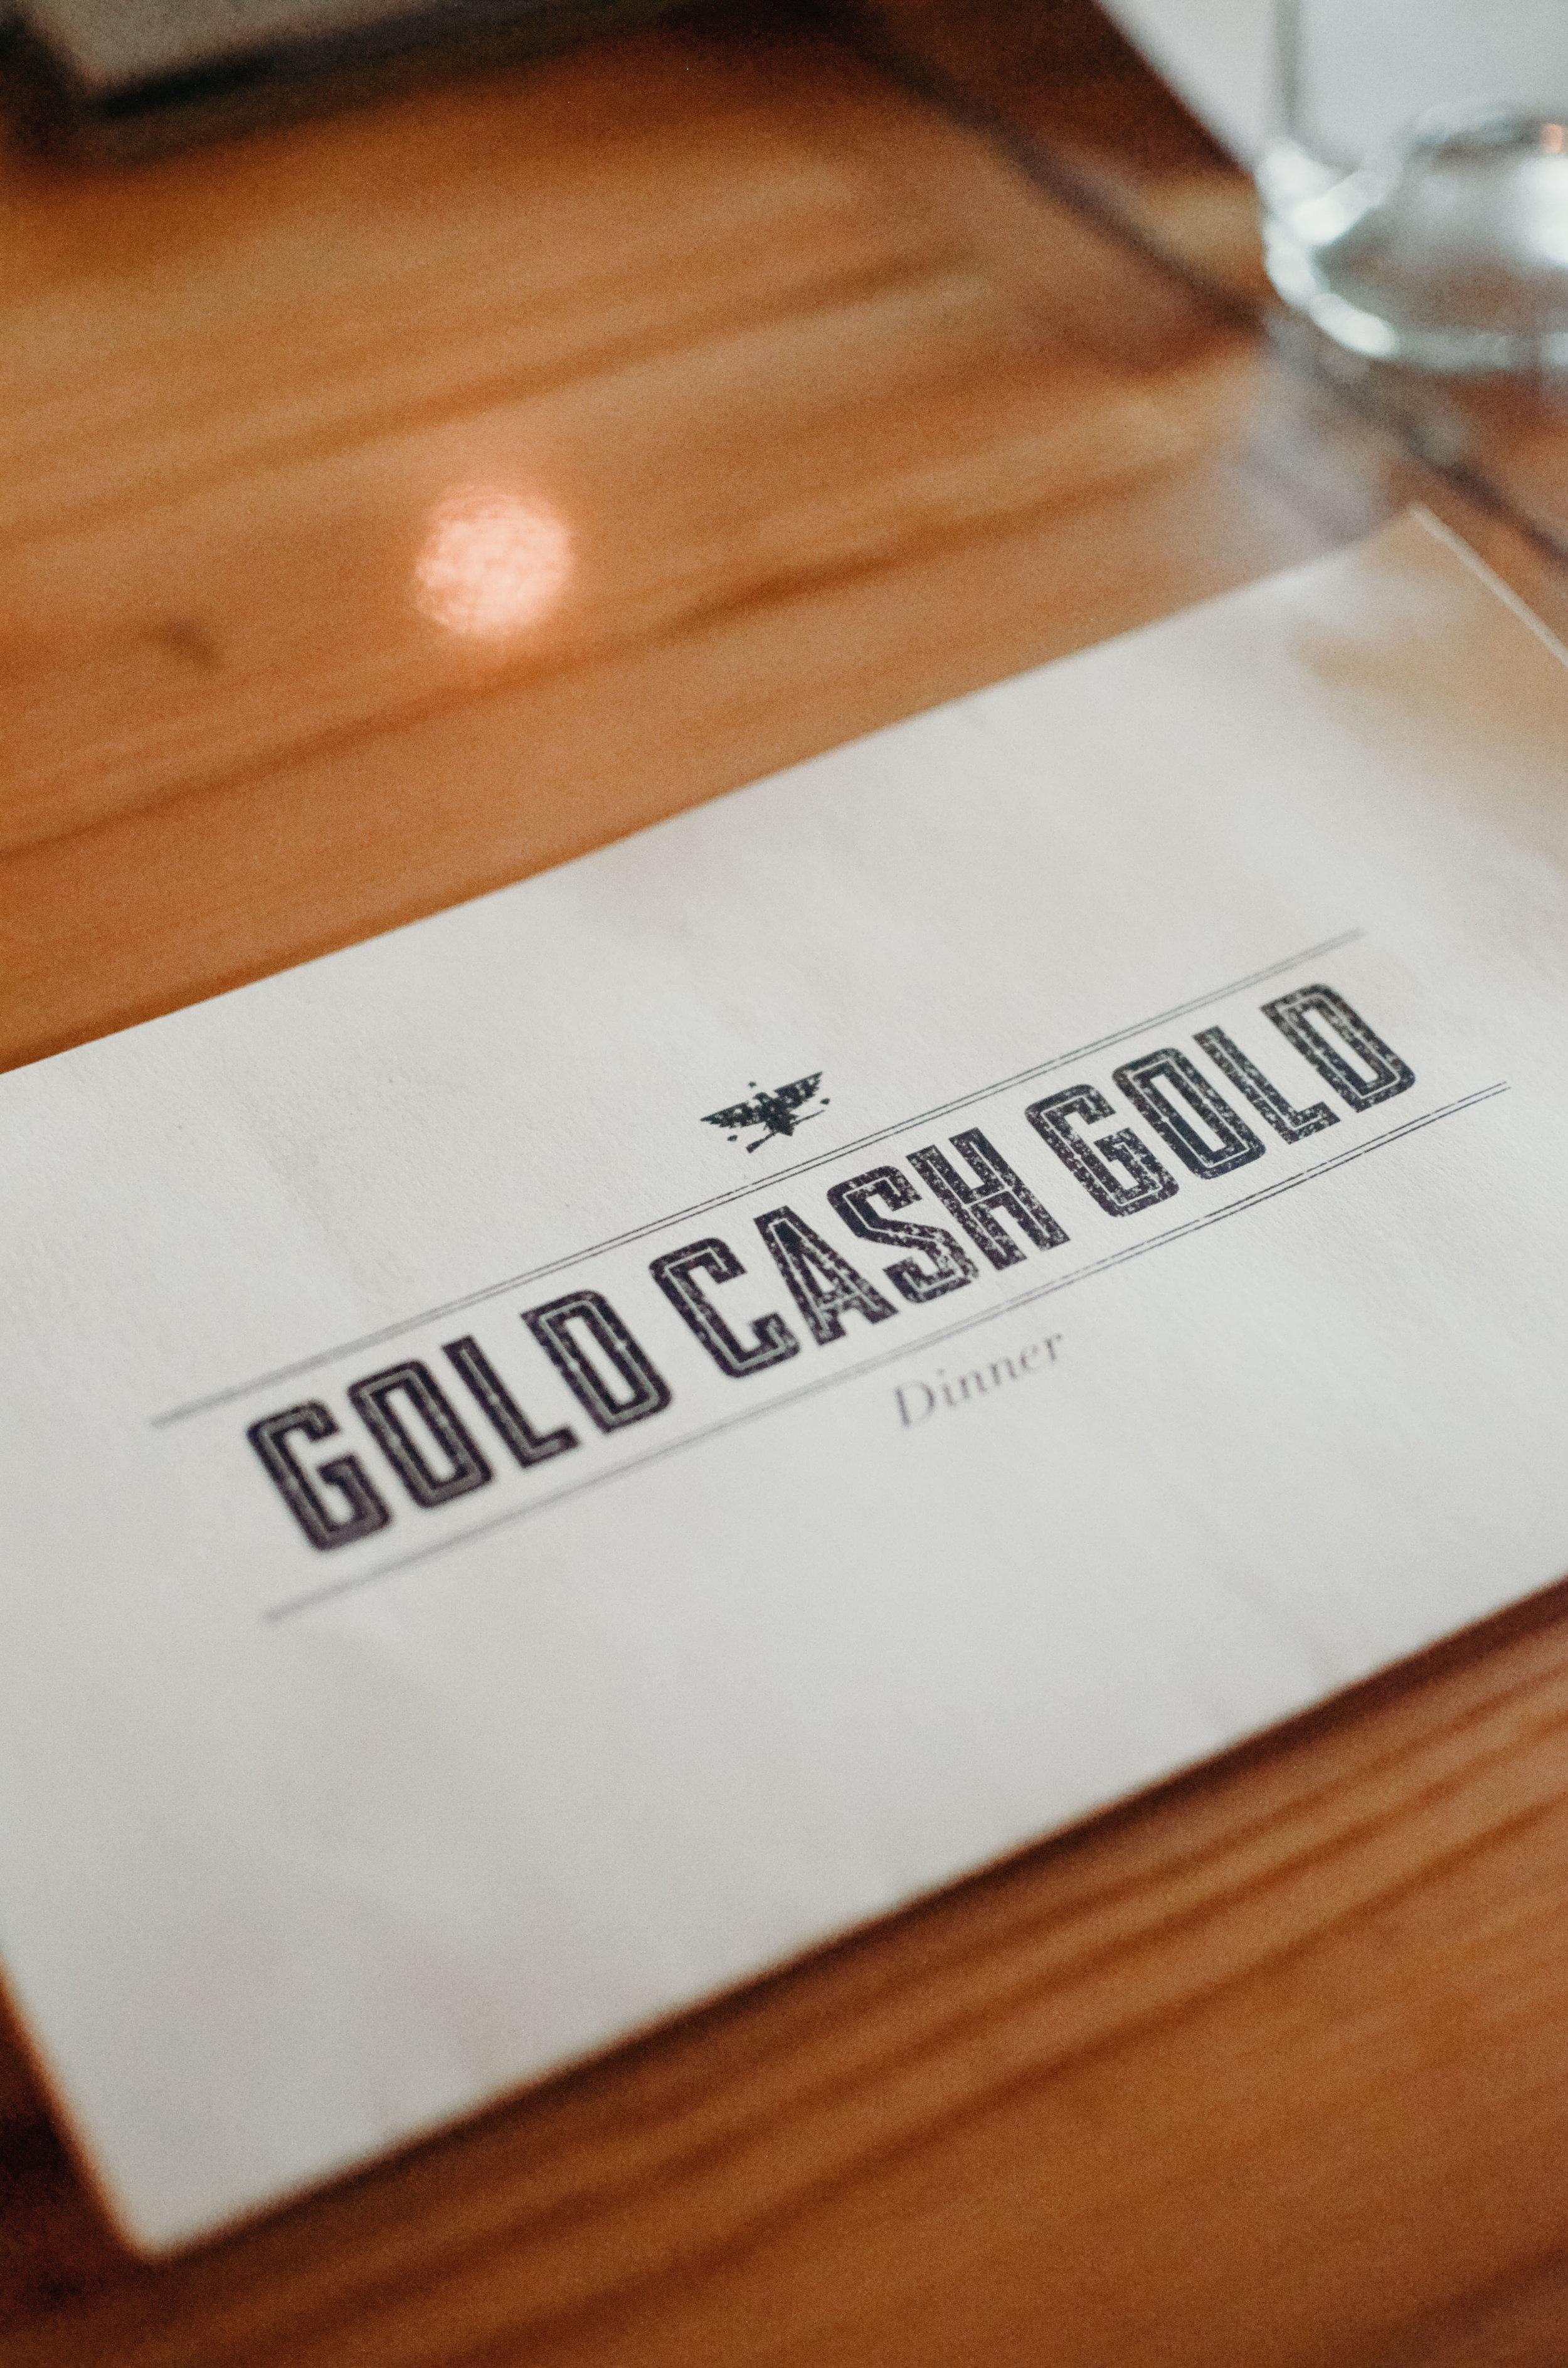 Wendling_Boyd_The_Art_of_Polishing_Off_Gold_Cash_Gold-5.jpg